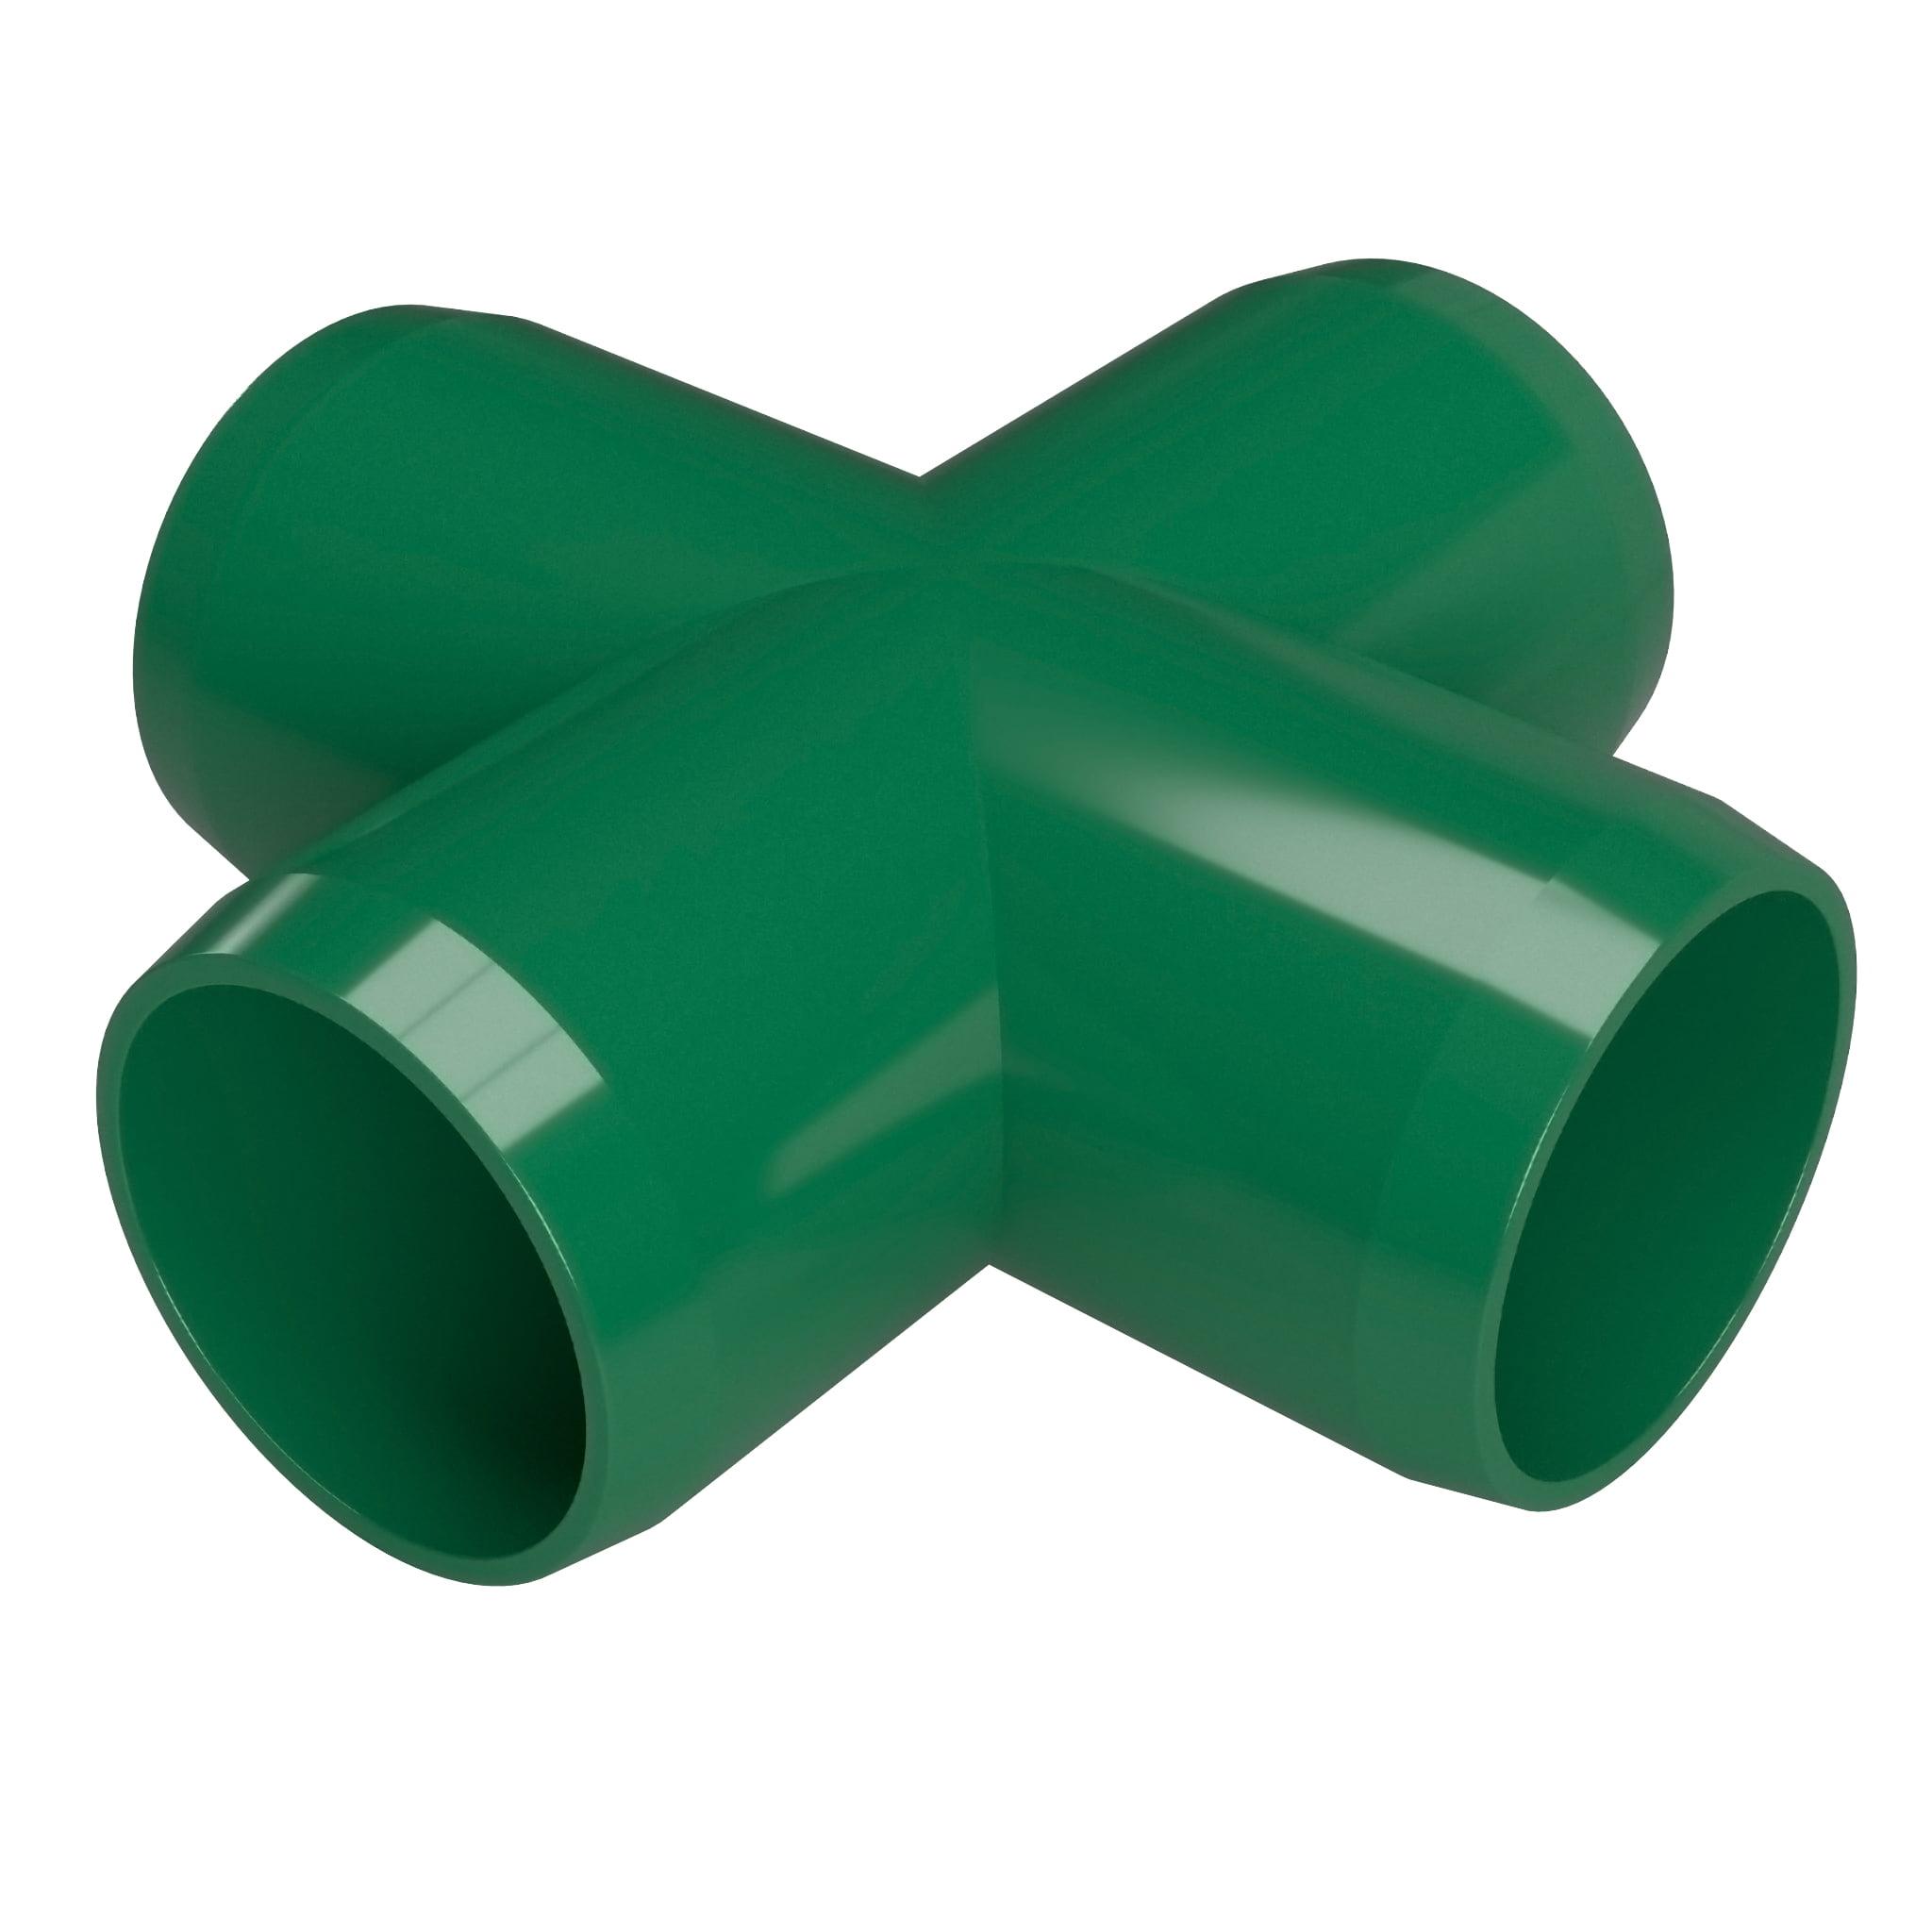 "FORMUFIT F114CRX-GR-4 Cross PVC Fitting, Furniture Grade, 1-1/4"" Size, Green , 4-Pack"